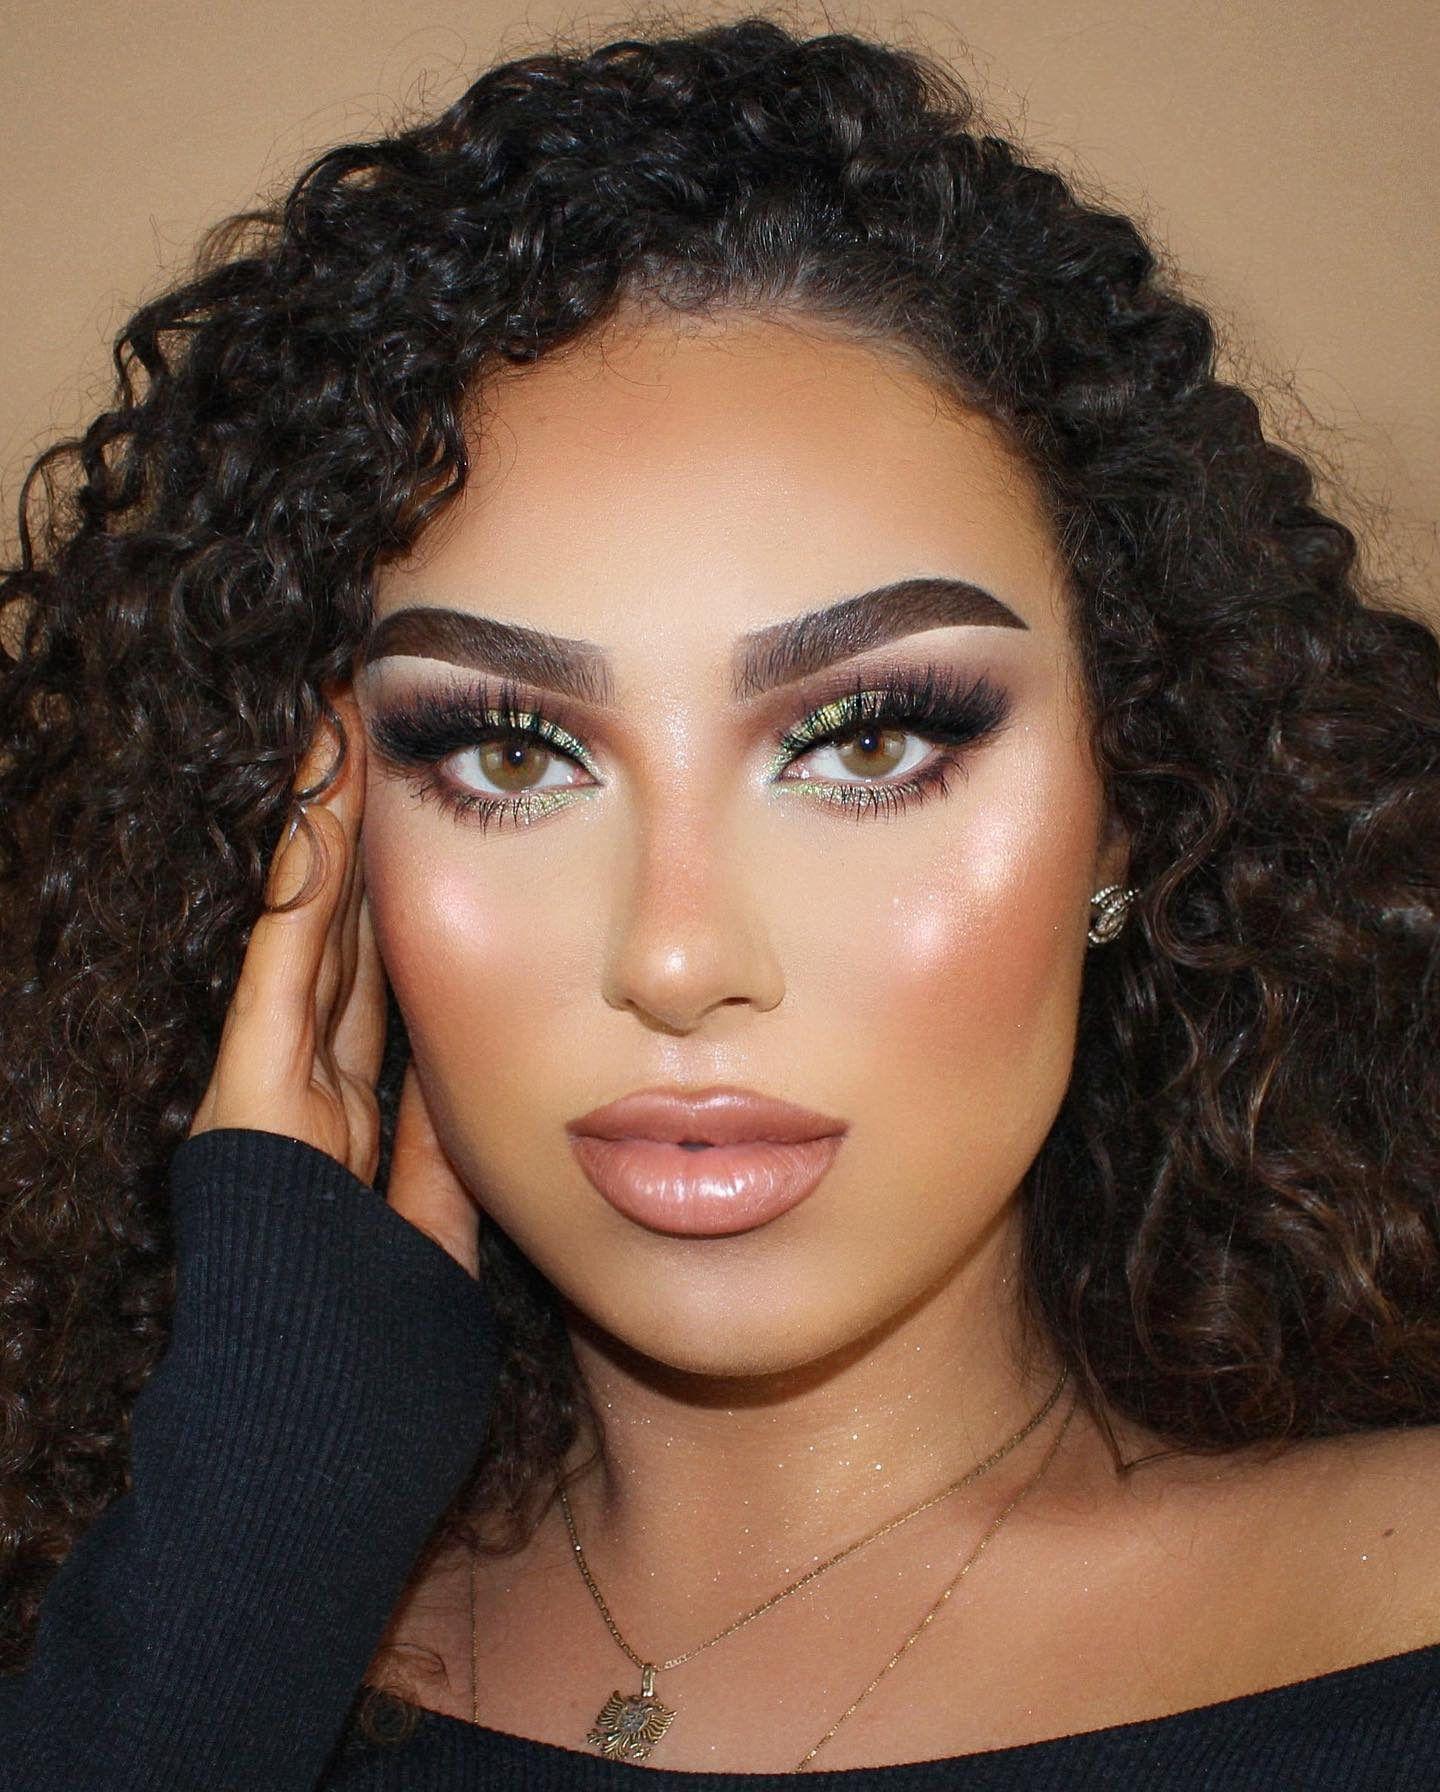 Enchanted Eyeshadow Palette in 2020 Eyeshadow, Eyeshadow